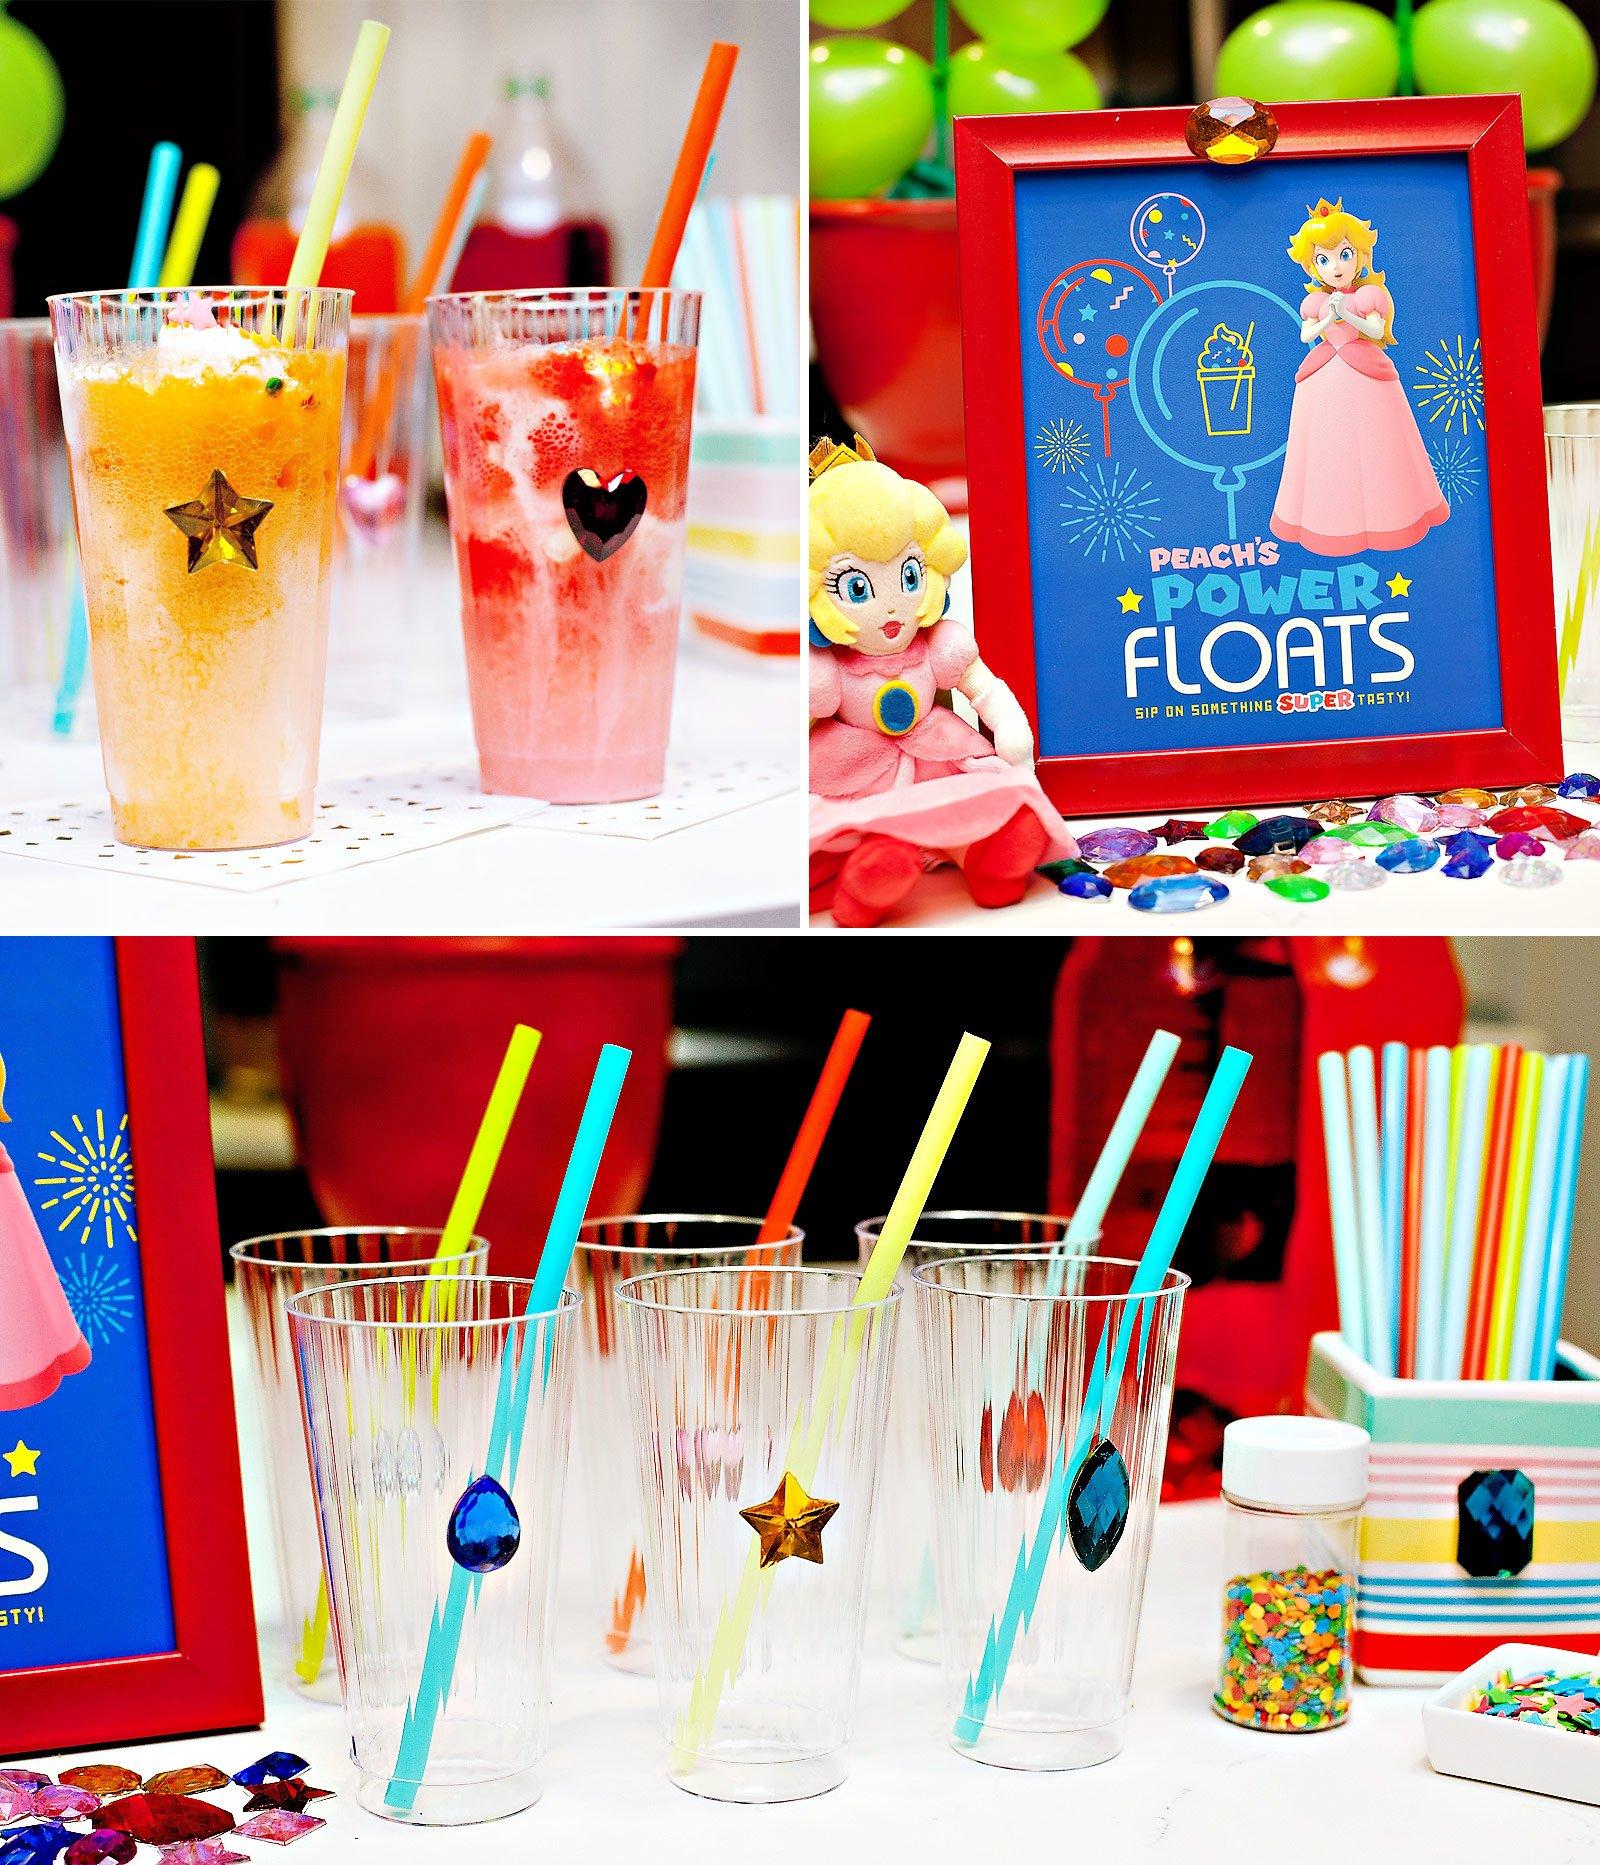 Super Mario Ice Cream Floats - Princess Peach